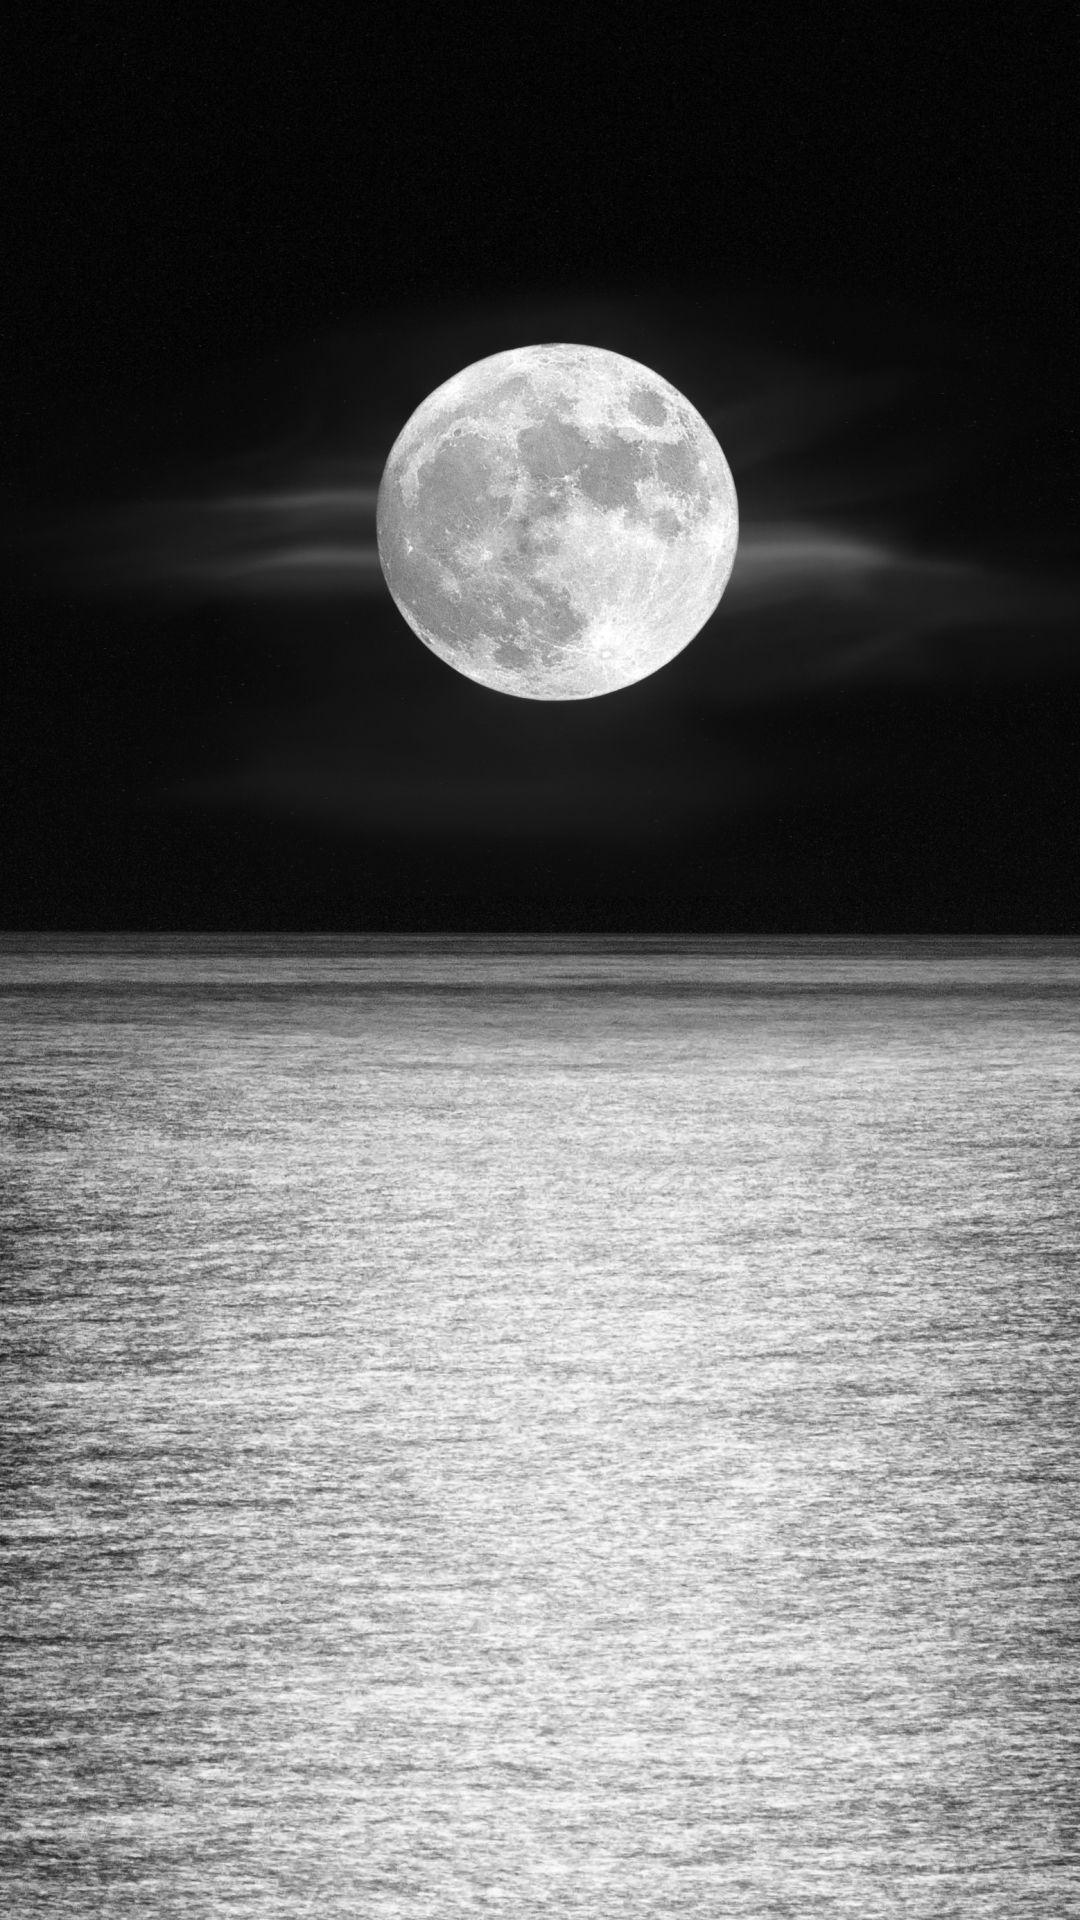 Moonlight Over The Ocean Earth Moon Black White Horizon Moon Moonlight Ocean 1080x1920 Mobile Wallpaper Iphone Wallpaper Sky Black Wallpaper Ocean At Night